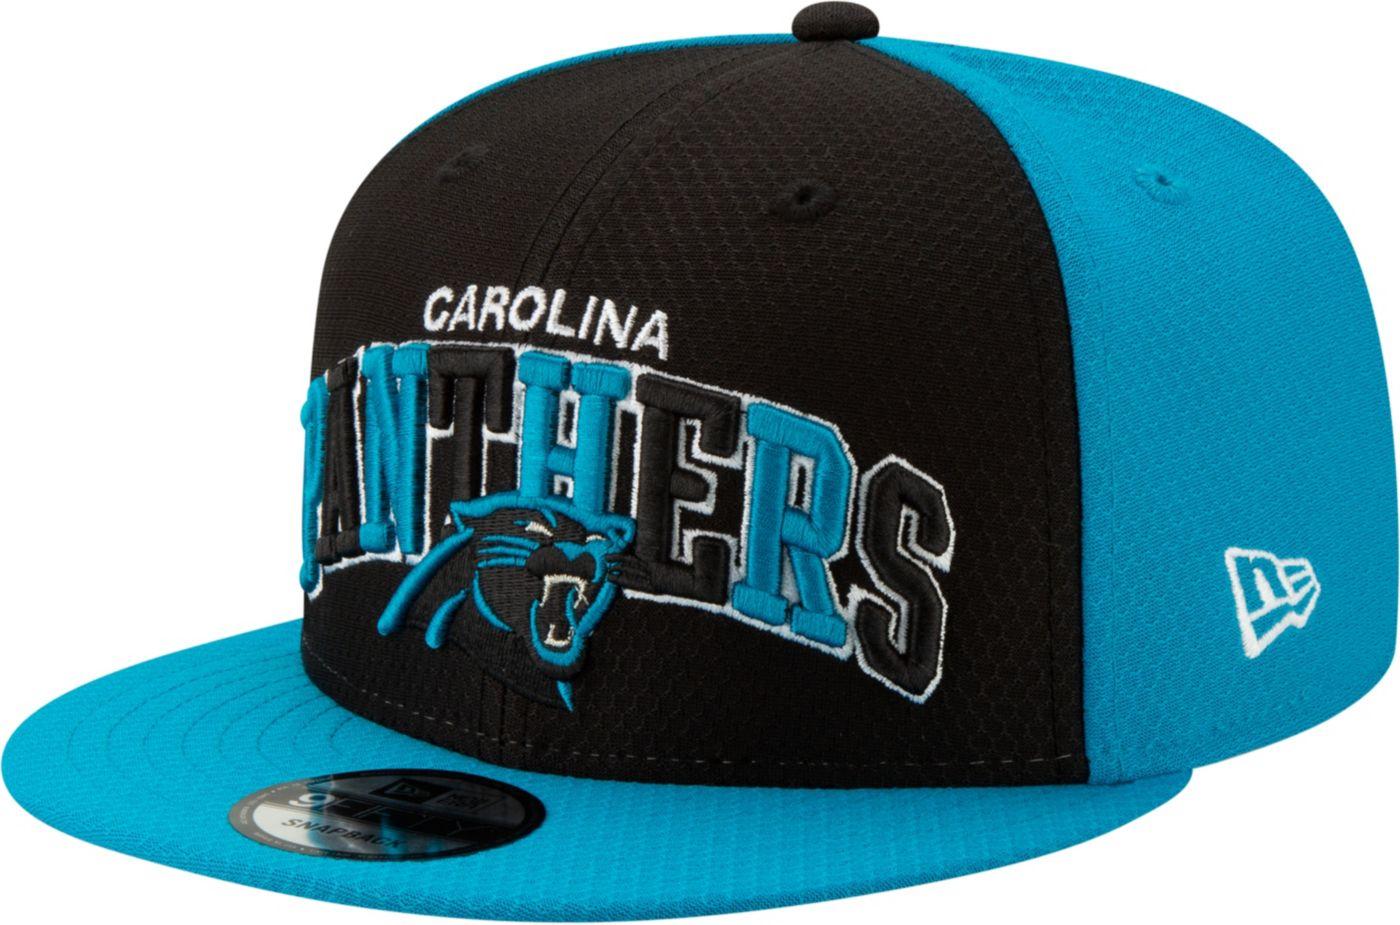 New Era Men's Carolina Panthers Sideline Home 9Fifty Adjustable Hat